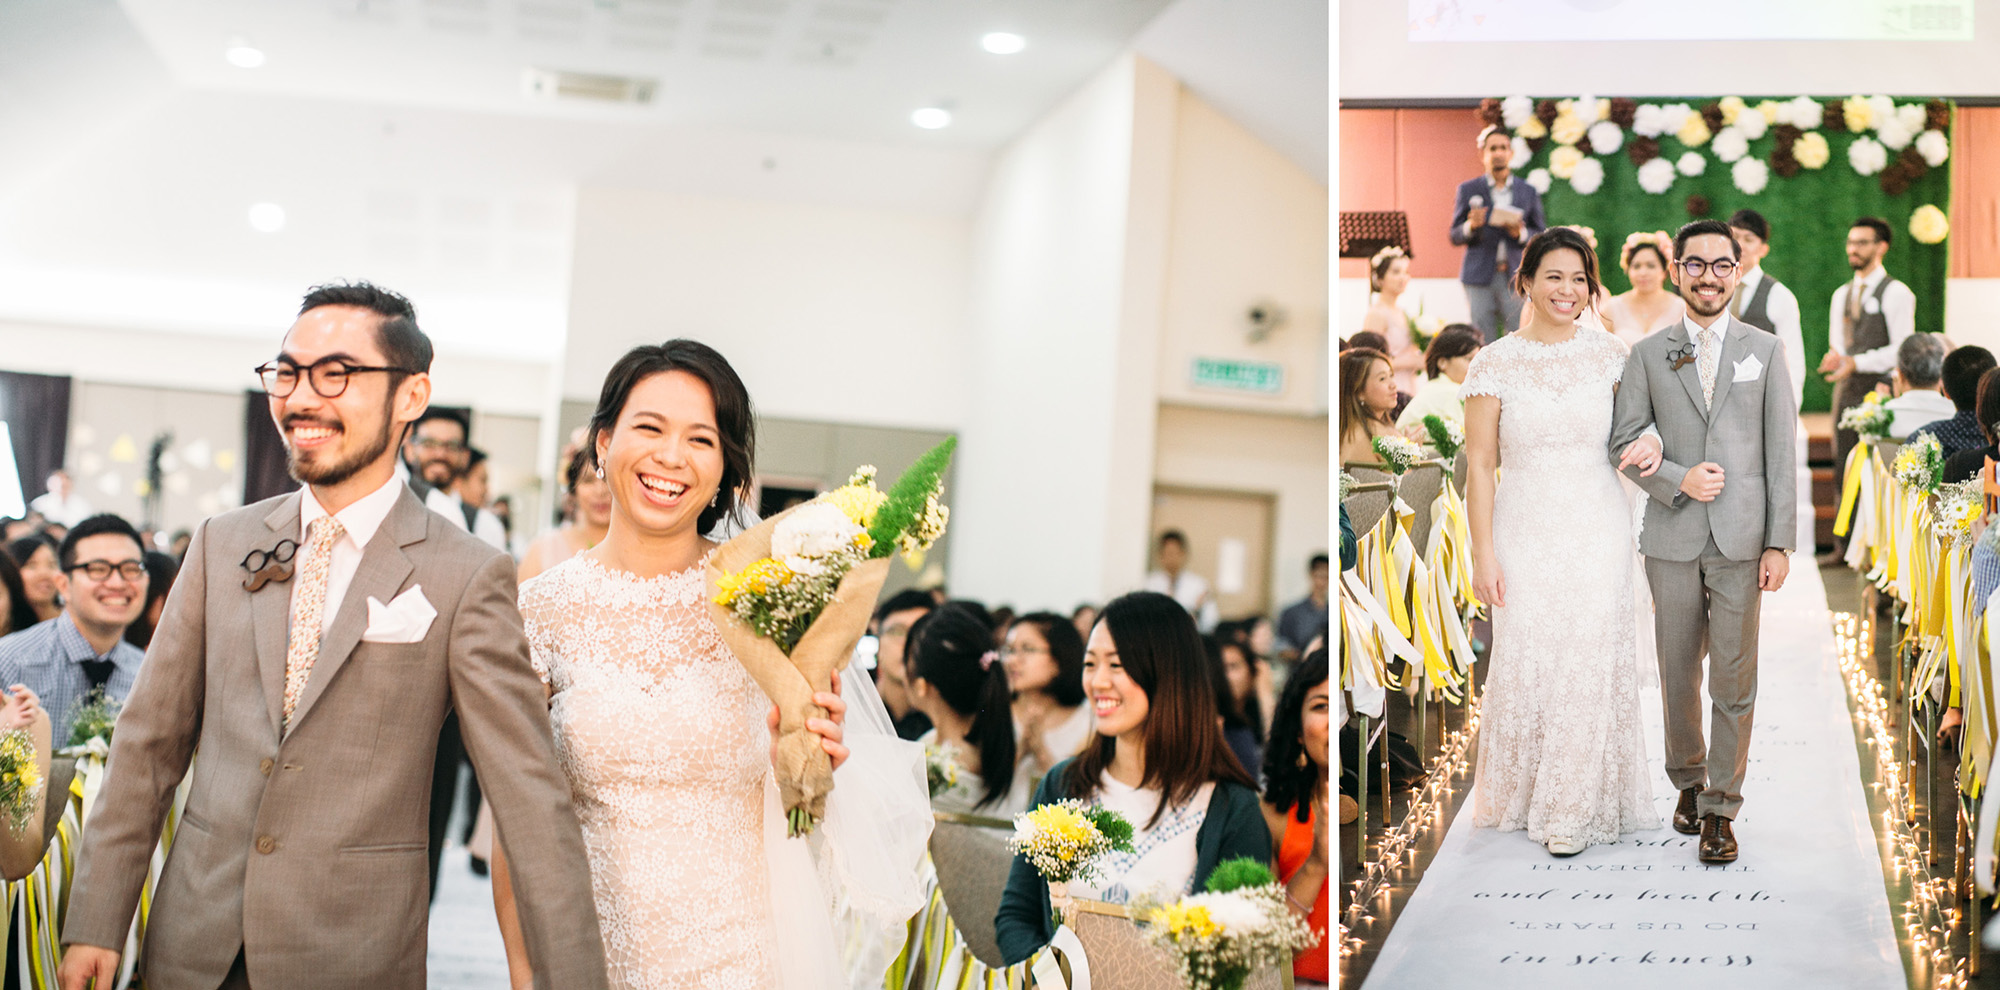 56-hellojanelee-sam grace-malaysia-wedding-day